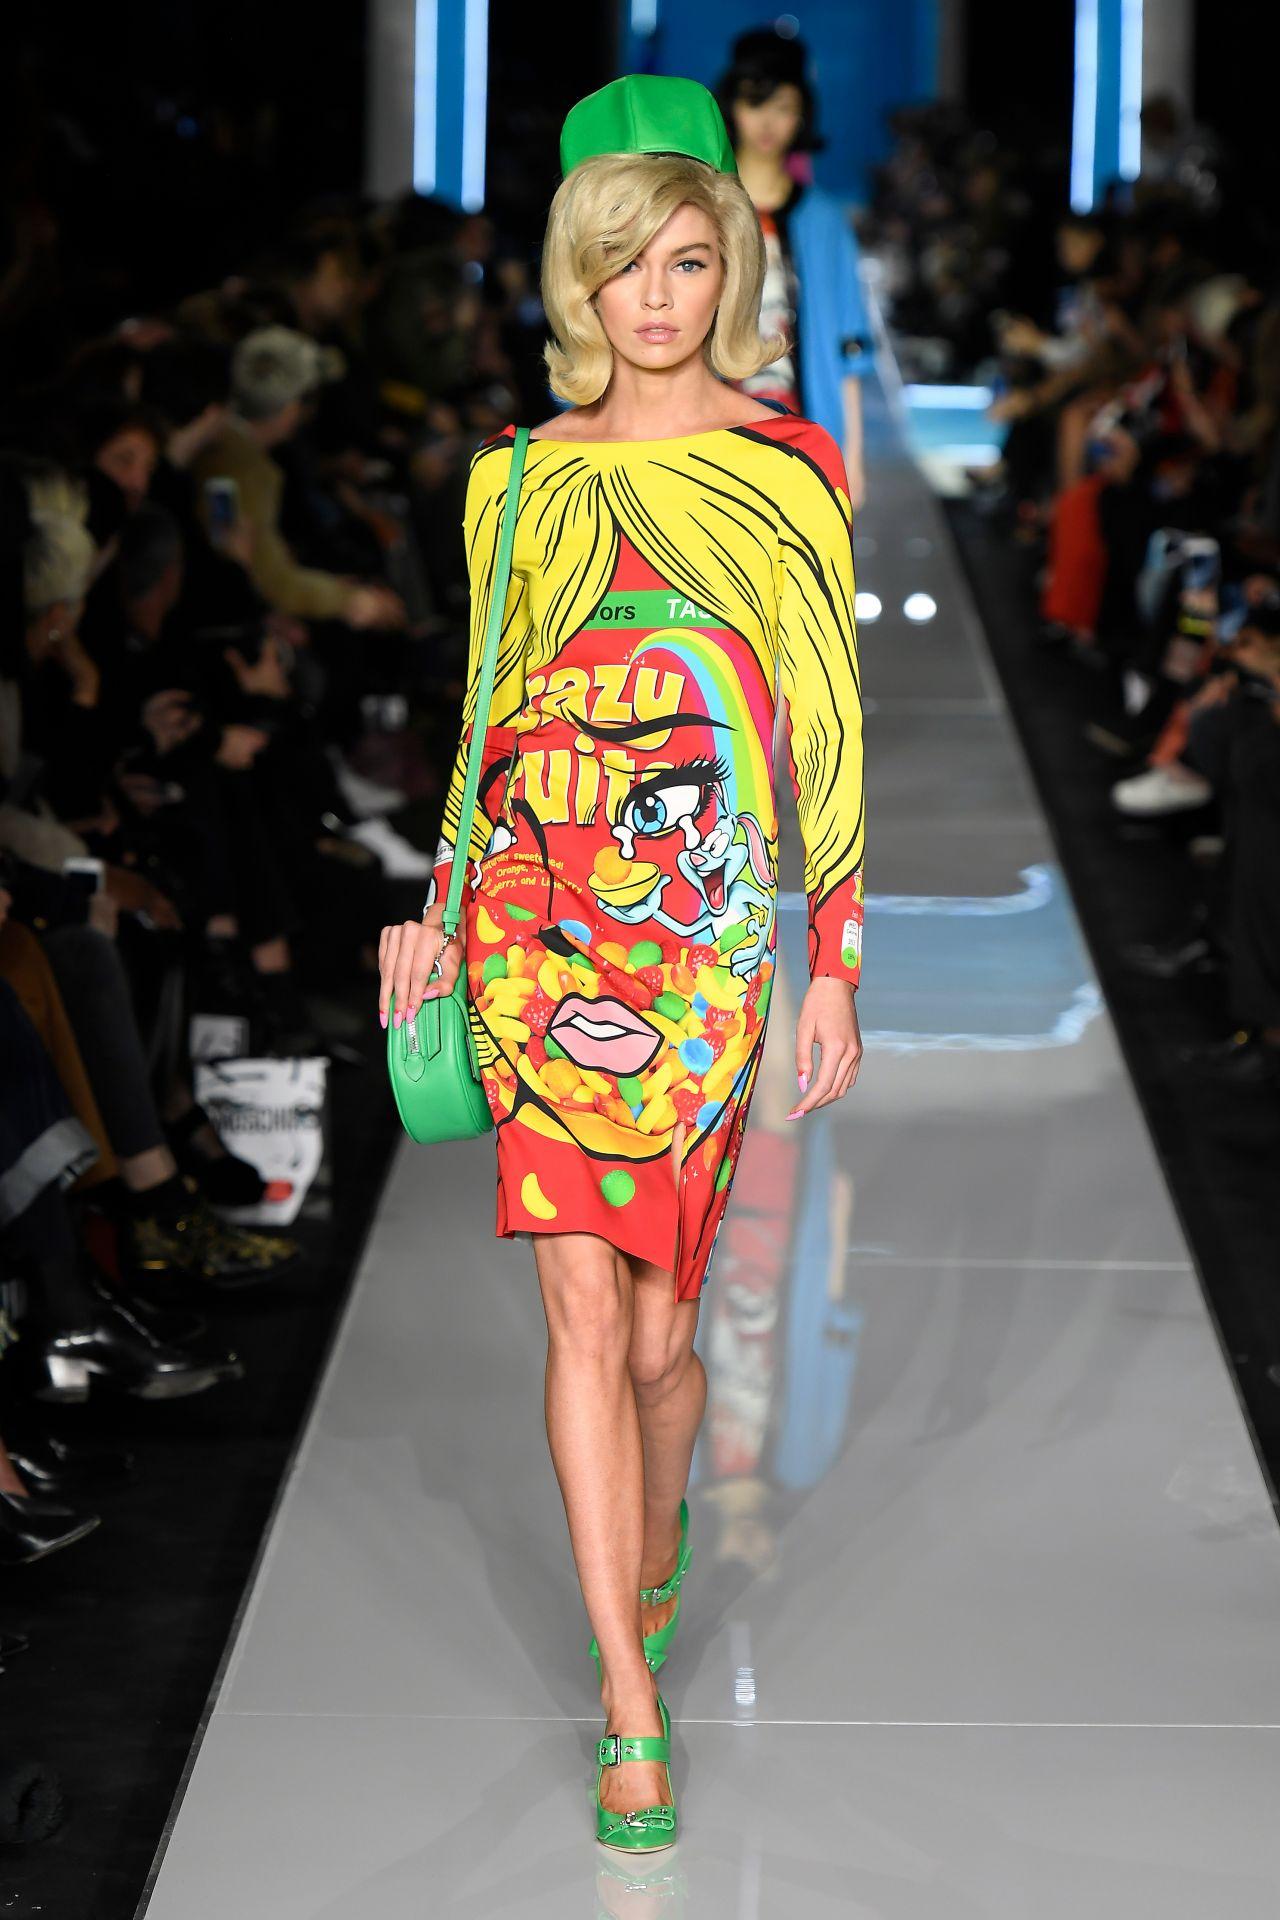 Fashion Week hit for Stella